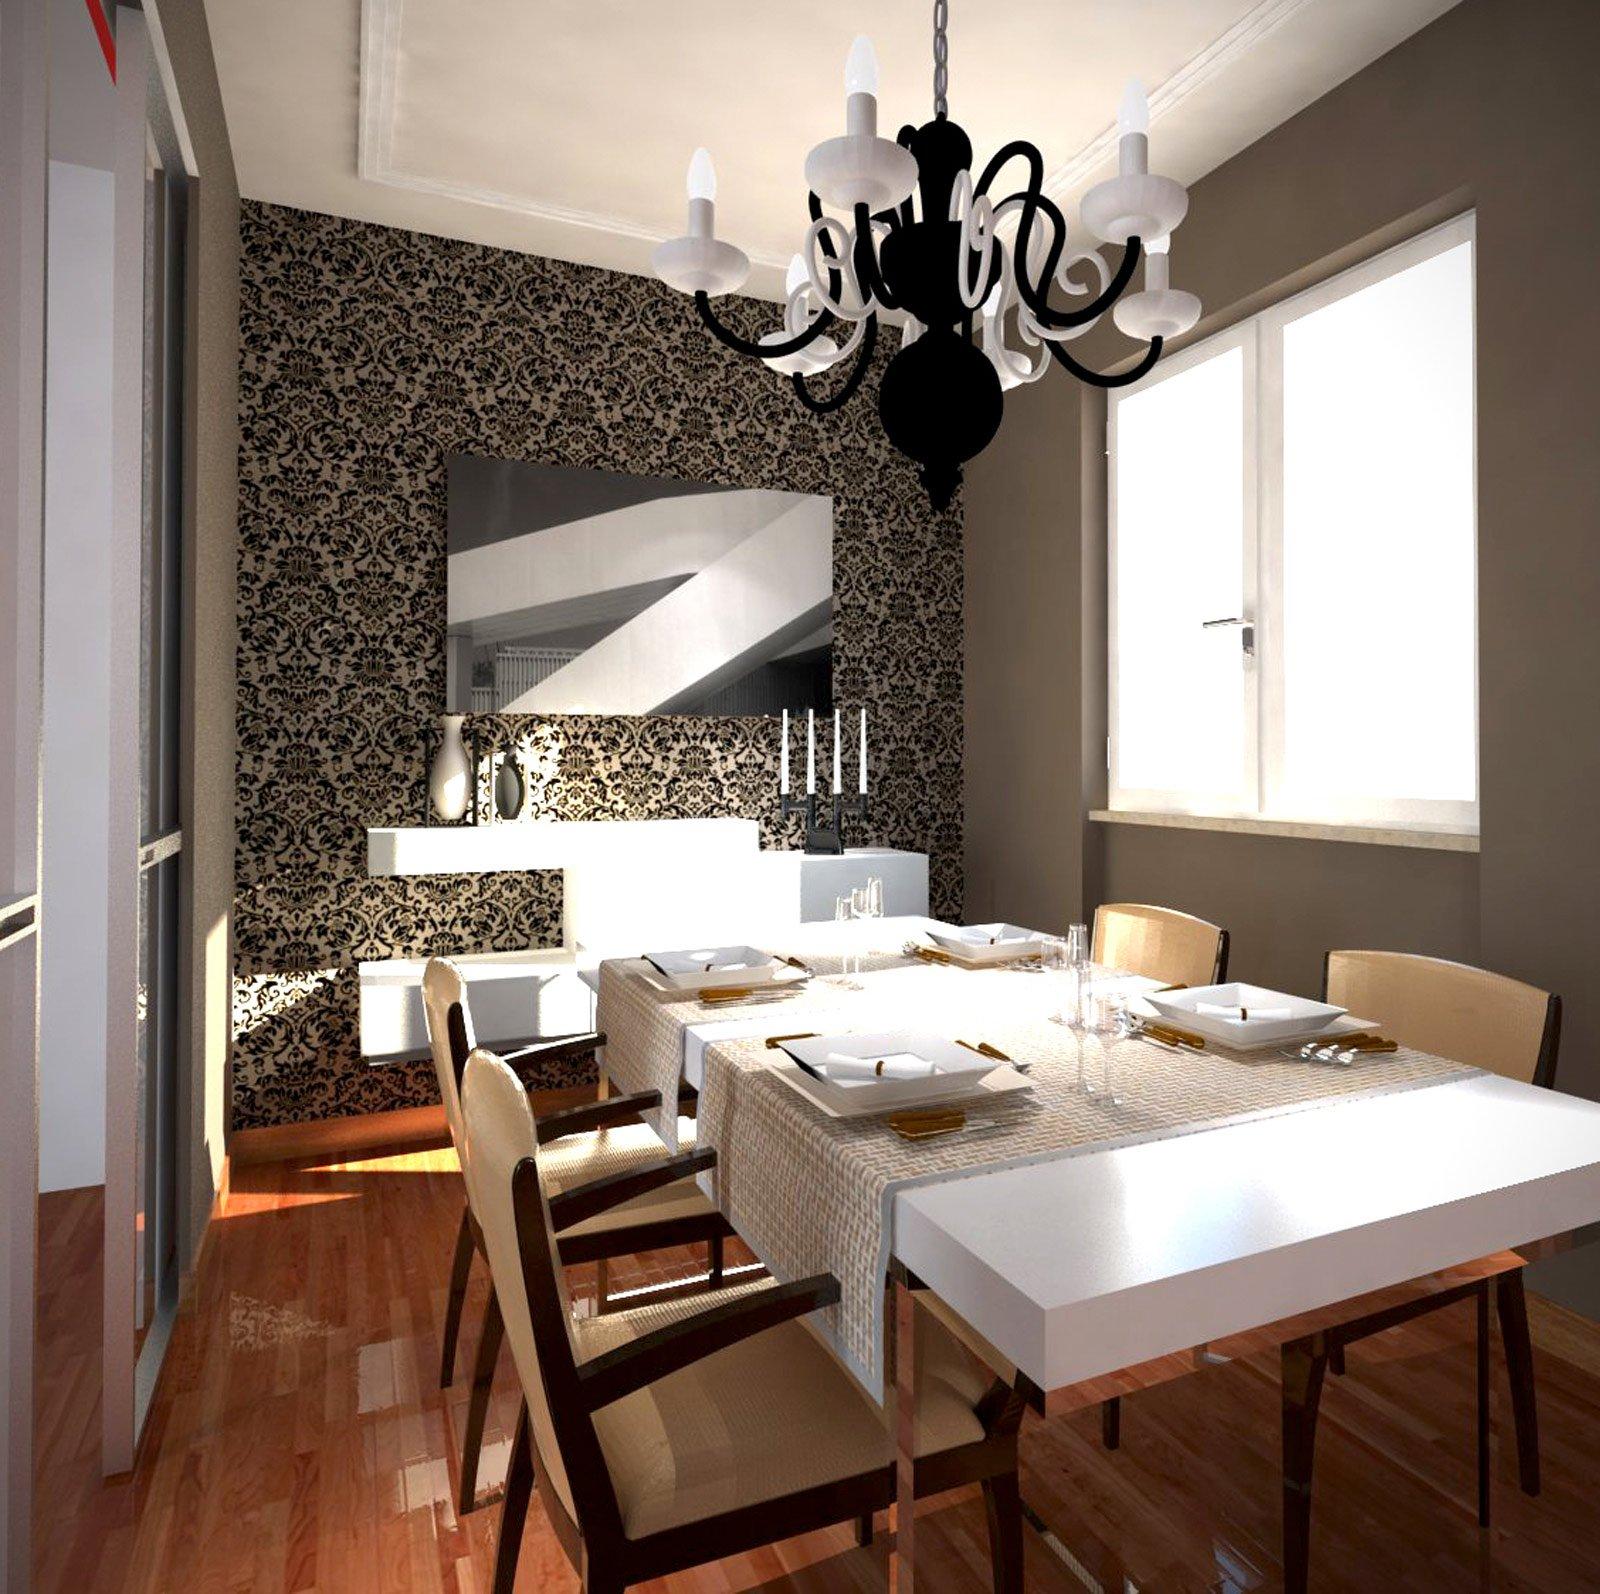 Apertura Nel Muro Tra Cucina E Sala Da Pranzo - Gardinen Ideen